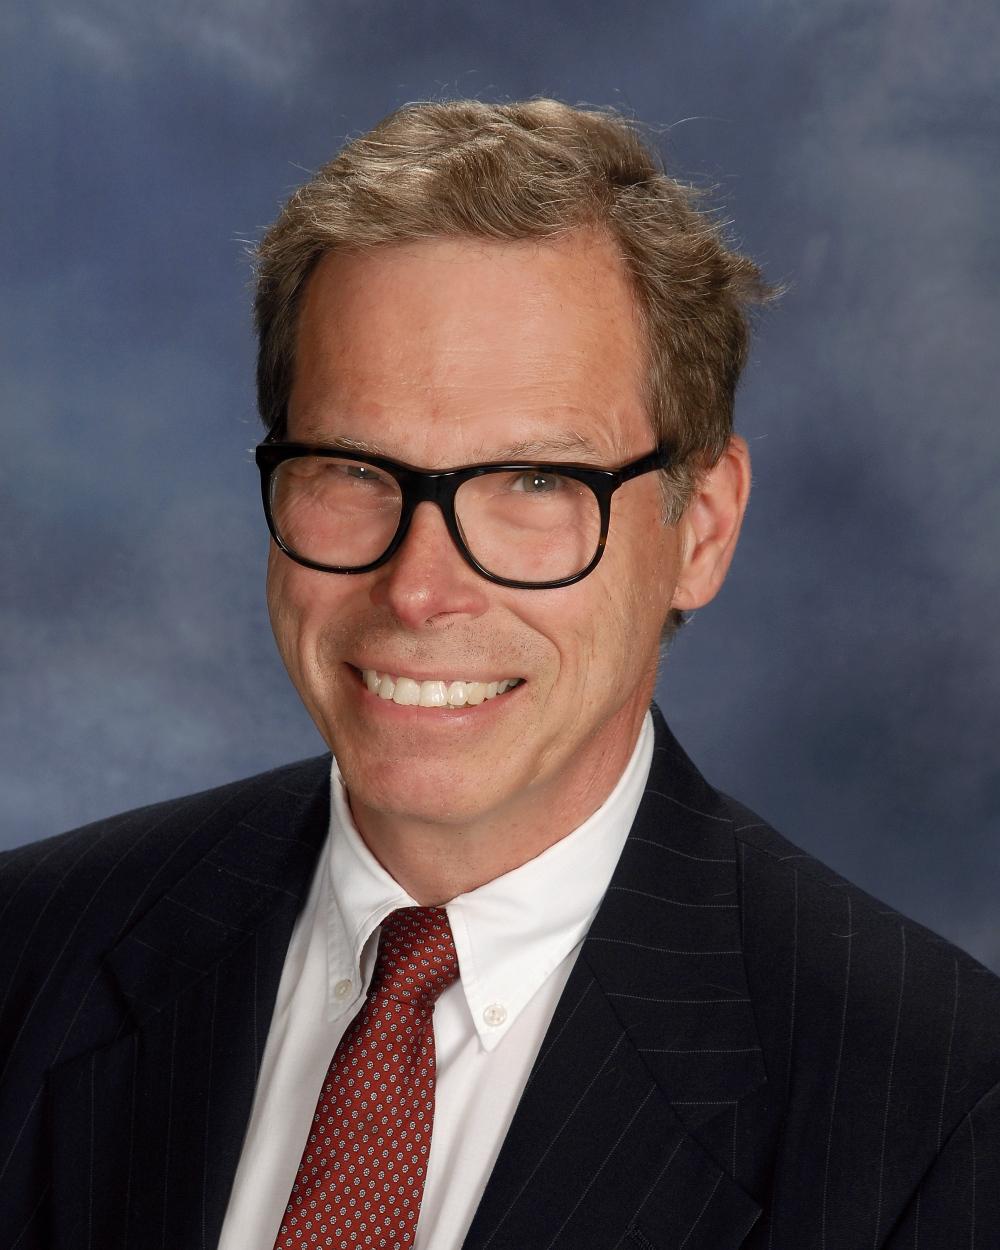 Reverend Dr. Mark Zier